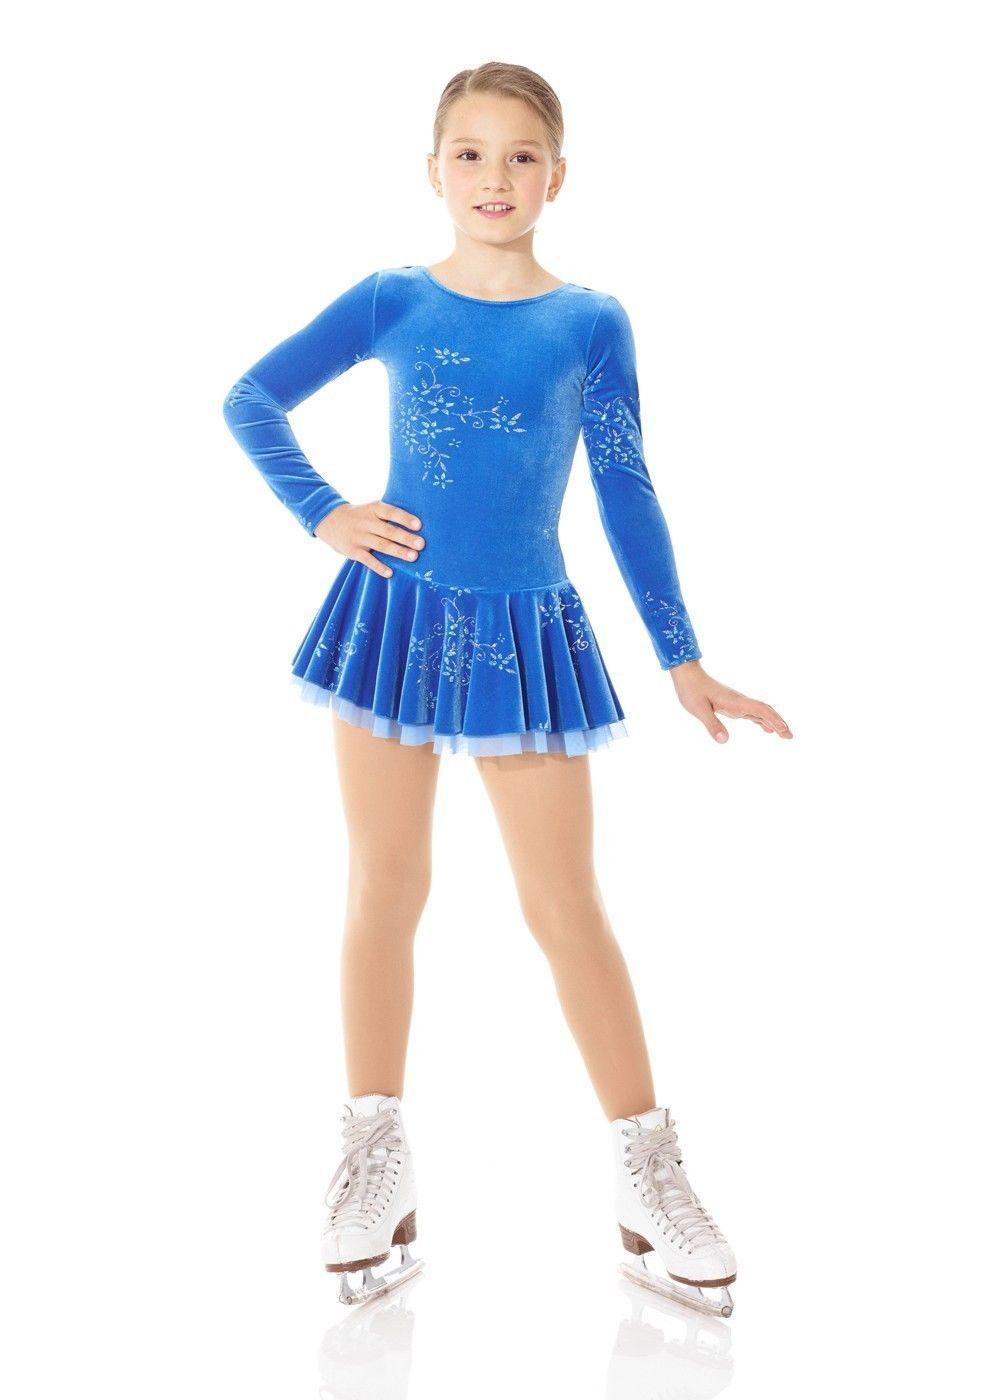 New Mondor Blue Velvet Ice Figure Skating Dress 2747 Forget MI Size Child 6  7  061f3f5b7c8cb